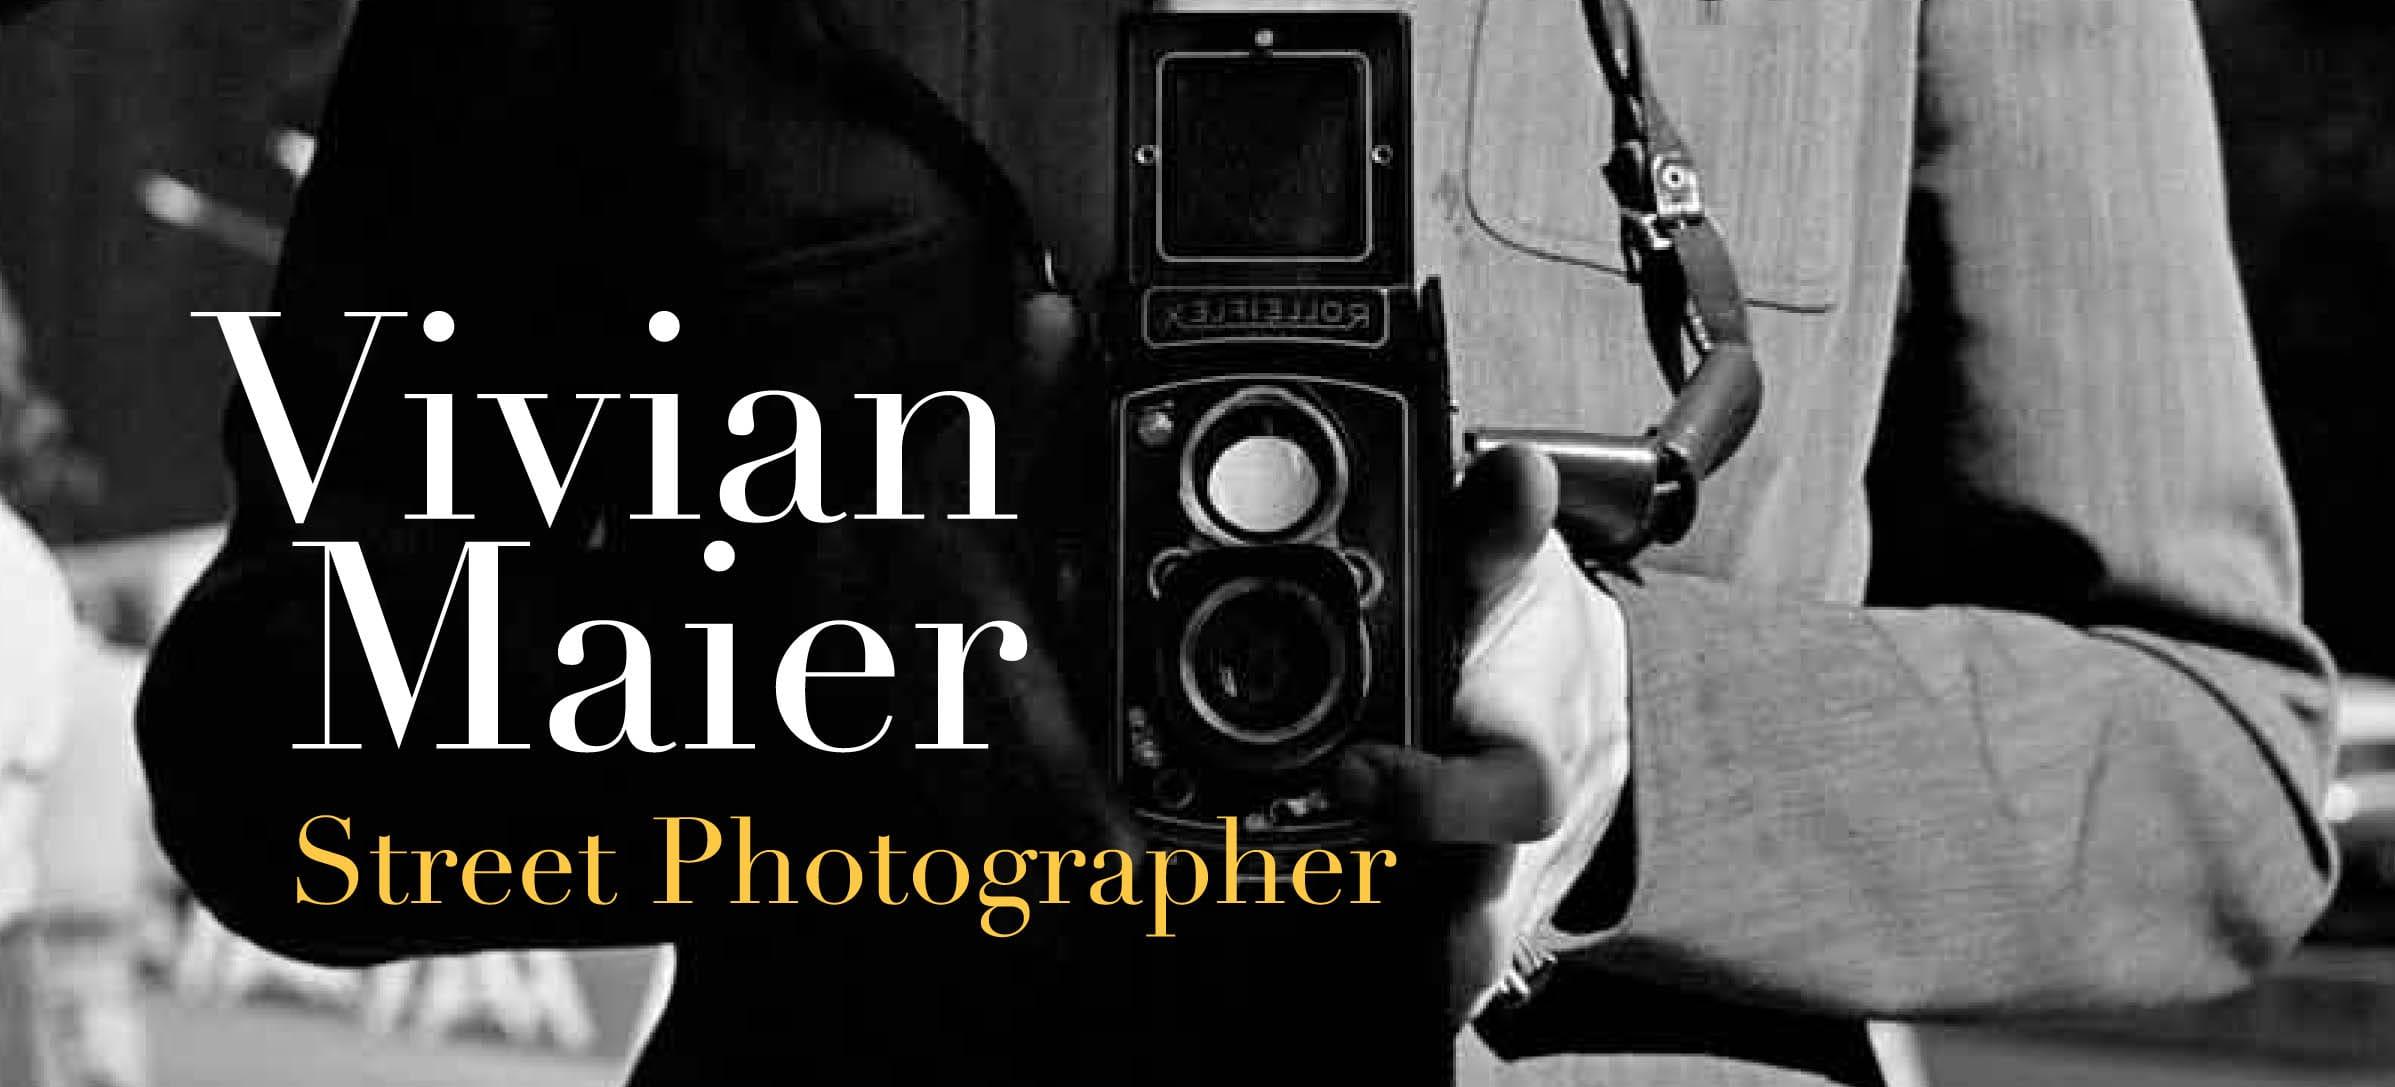 Streethunters Bookshelf: Vivian Maier: Street Photographer